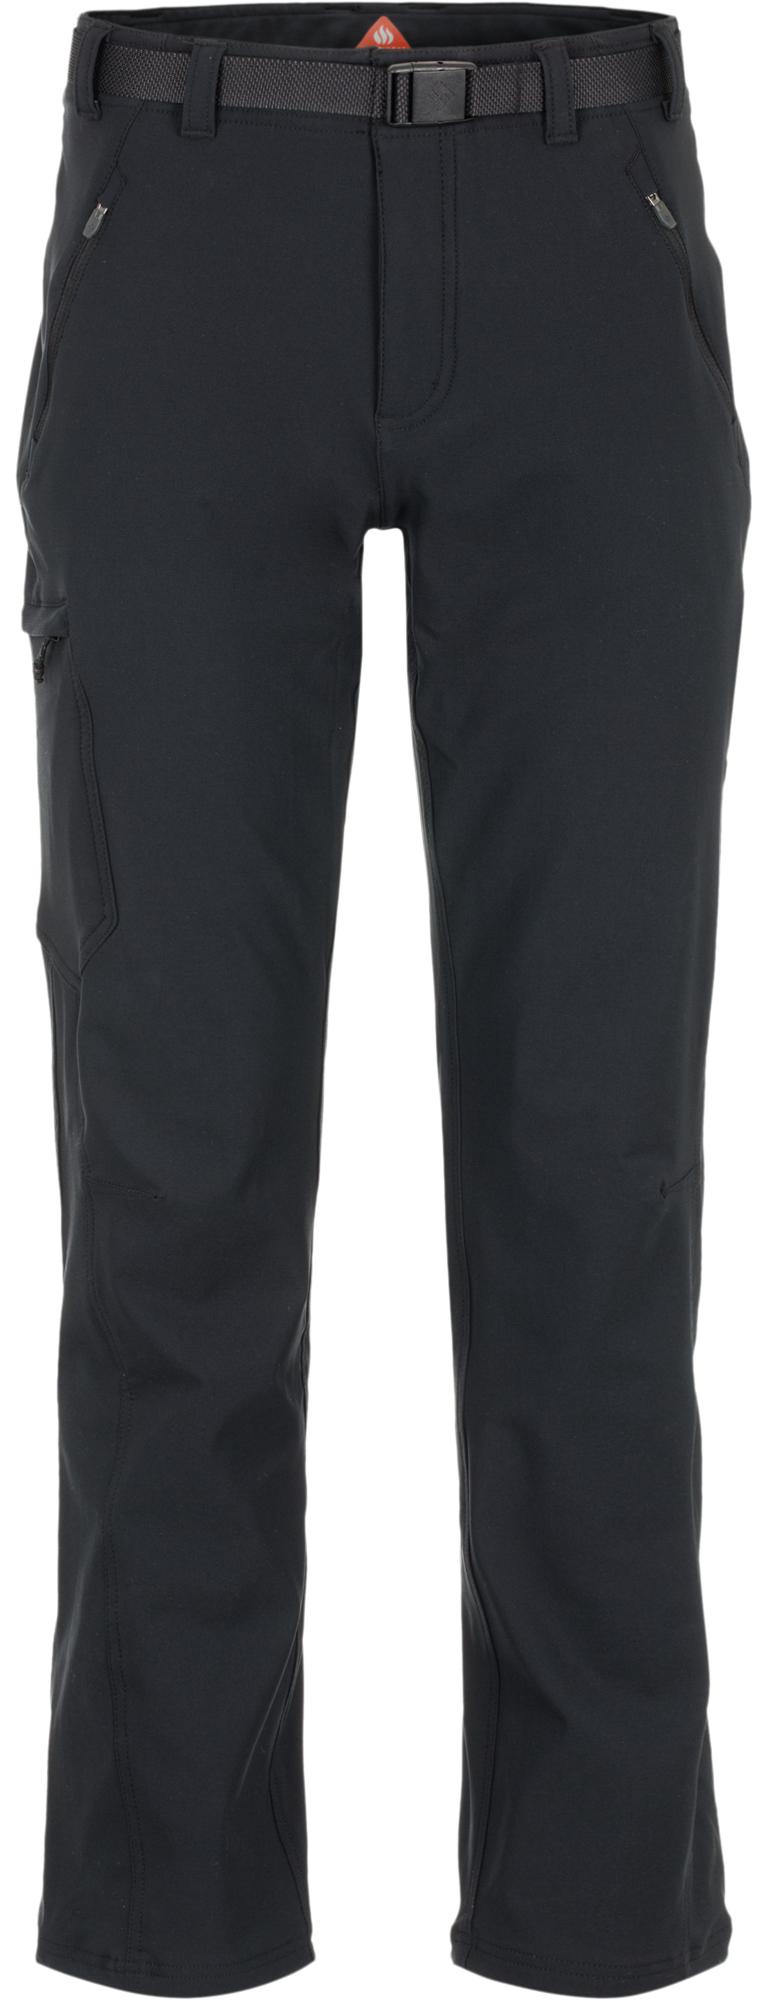 Columbia Брюки утепленные мужские Columbia Maxtrail Heat columbia брюки утепленные мужские columbia roc